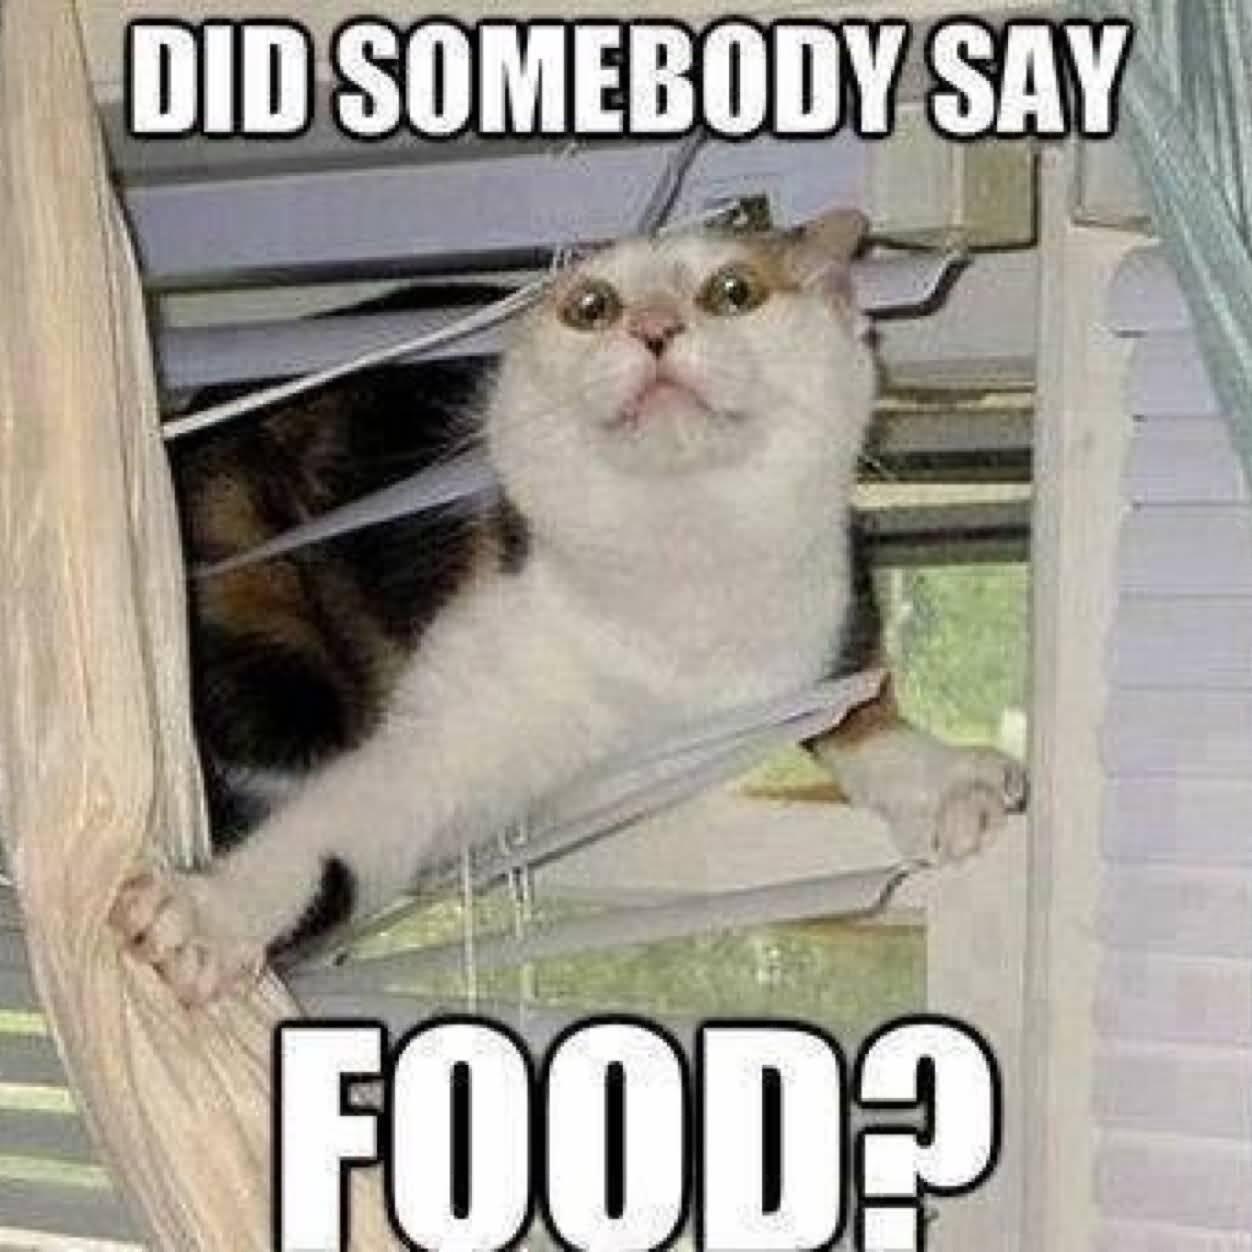 Funny Food Meme Image Photo Joke 10